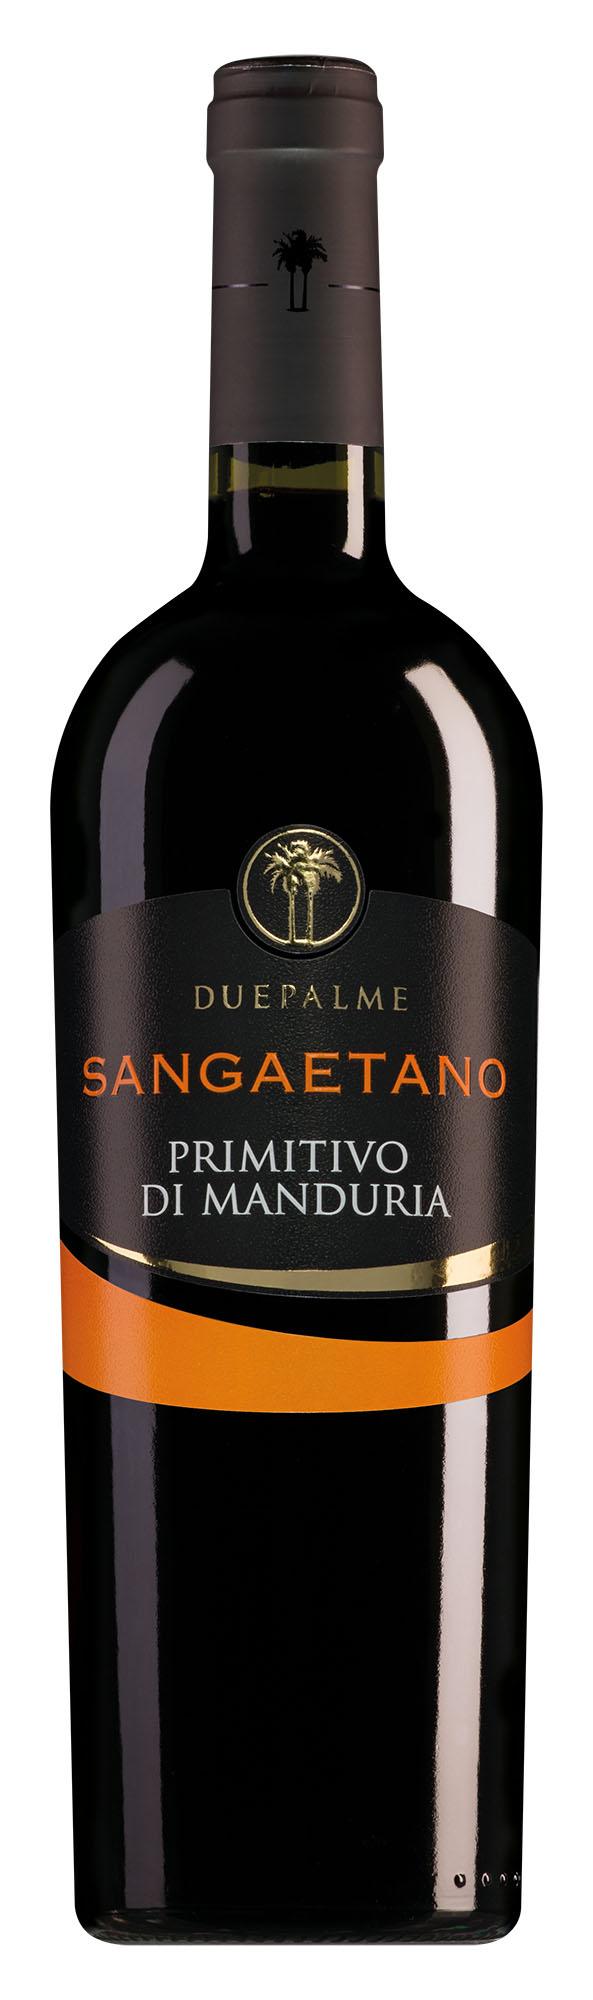 Cantine Due Palme Primitivo di Manduria Sangaetano